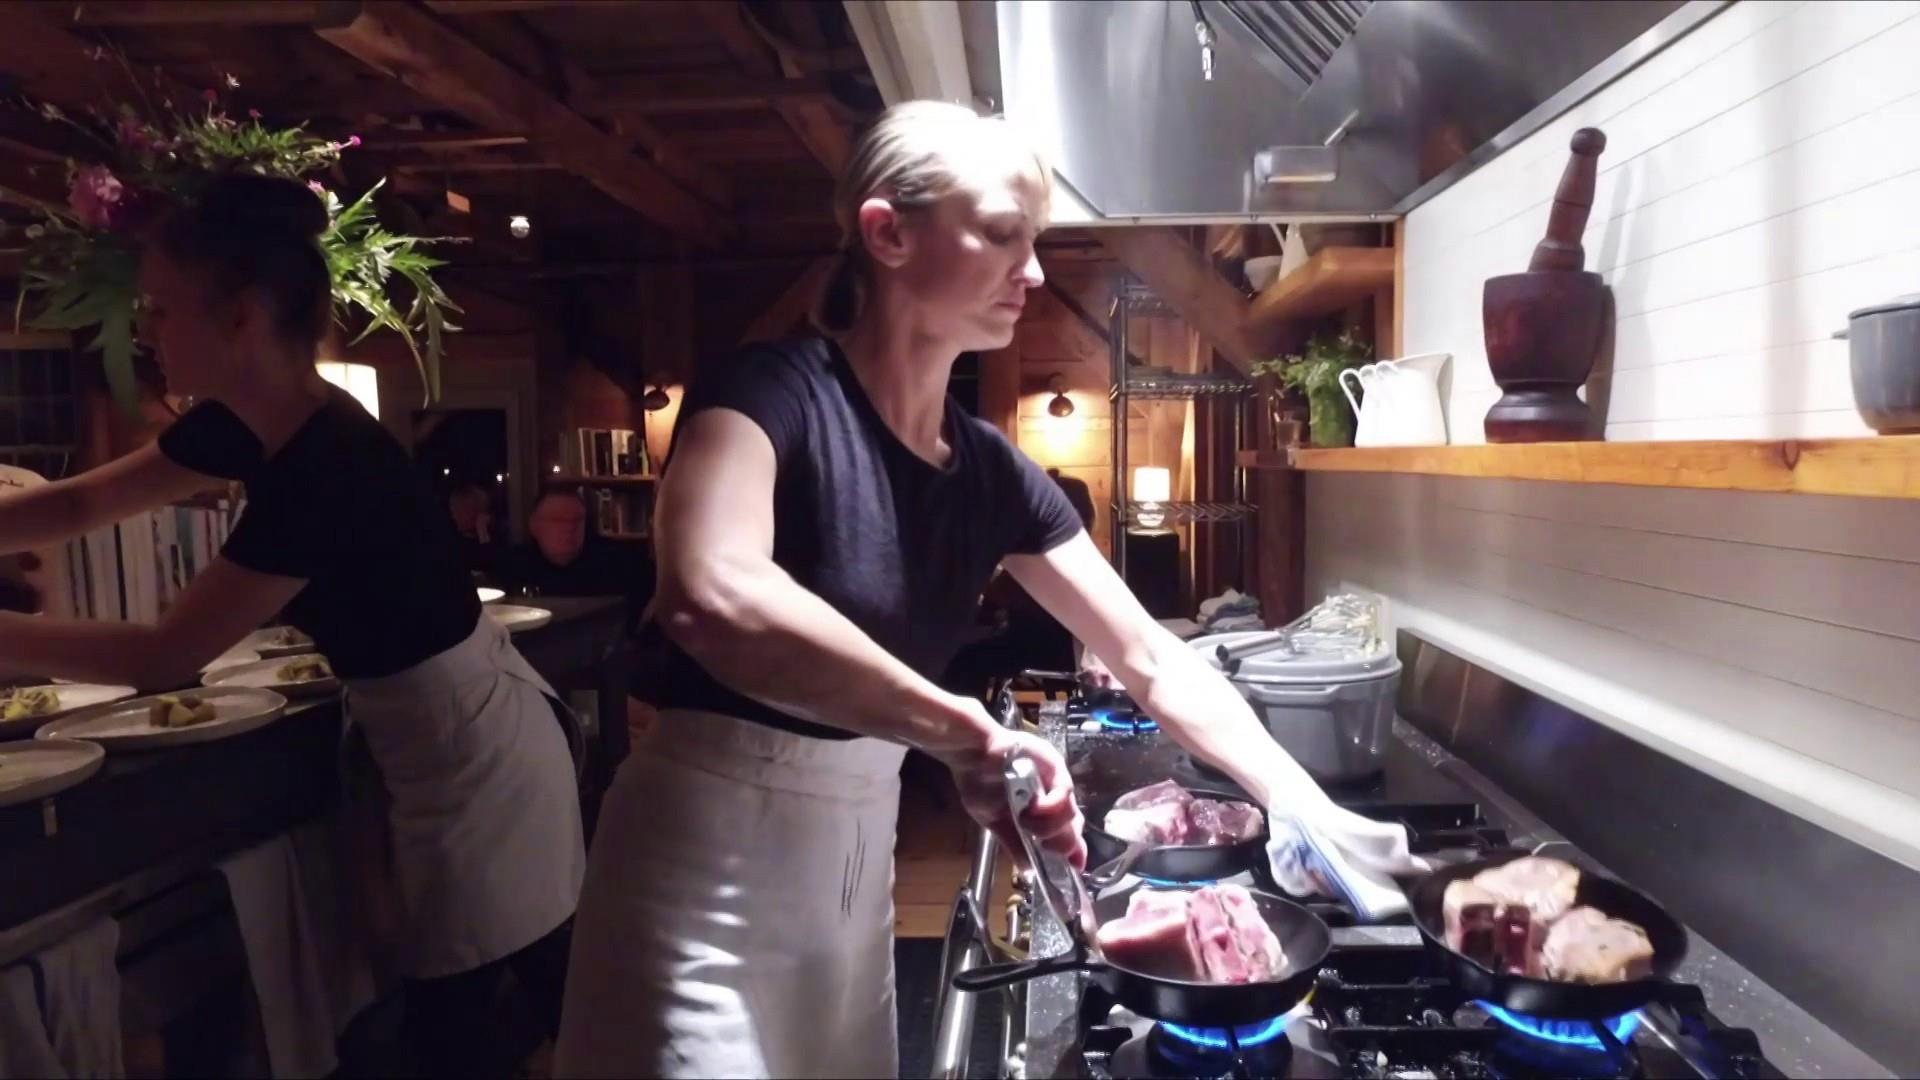 Meet The Chef Behind The Popular Restaurant In Maine Lost Kitchen